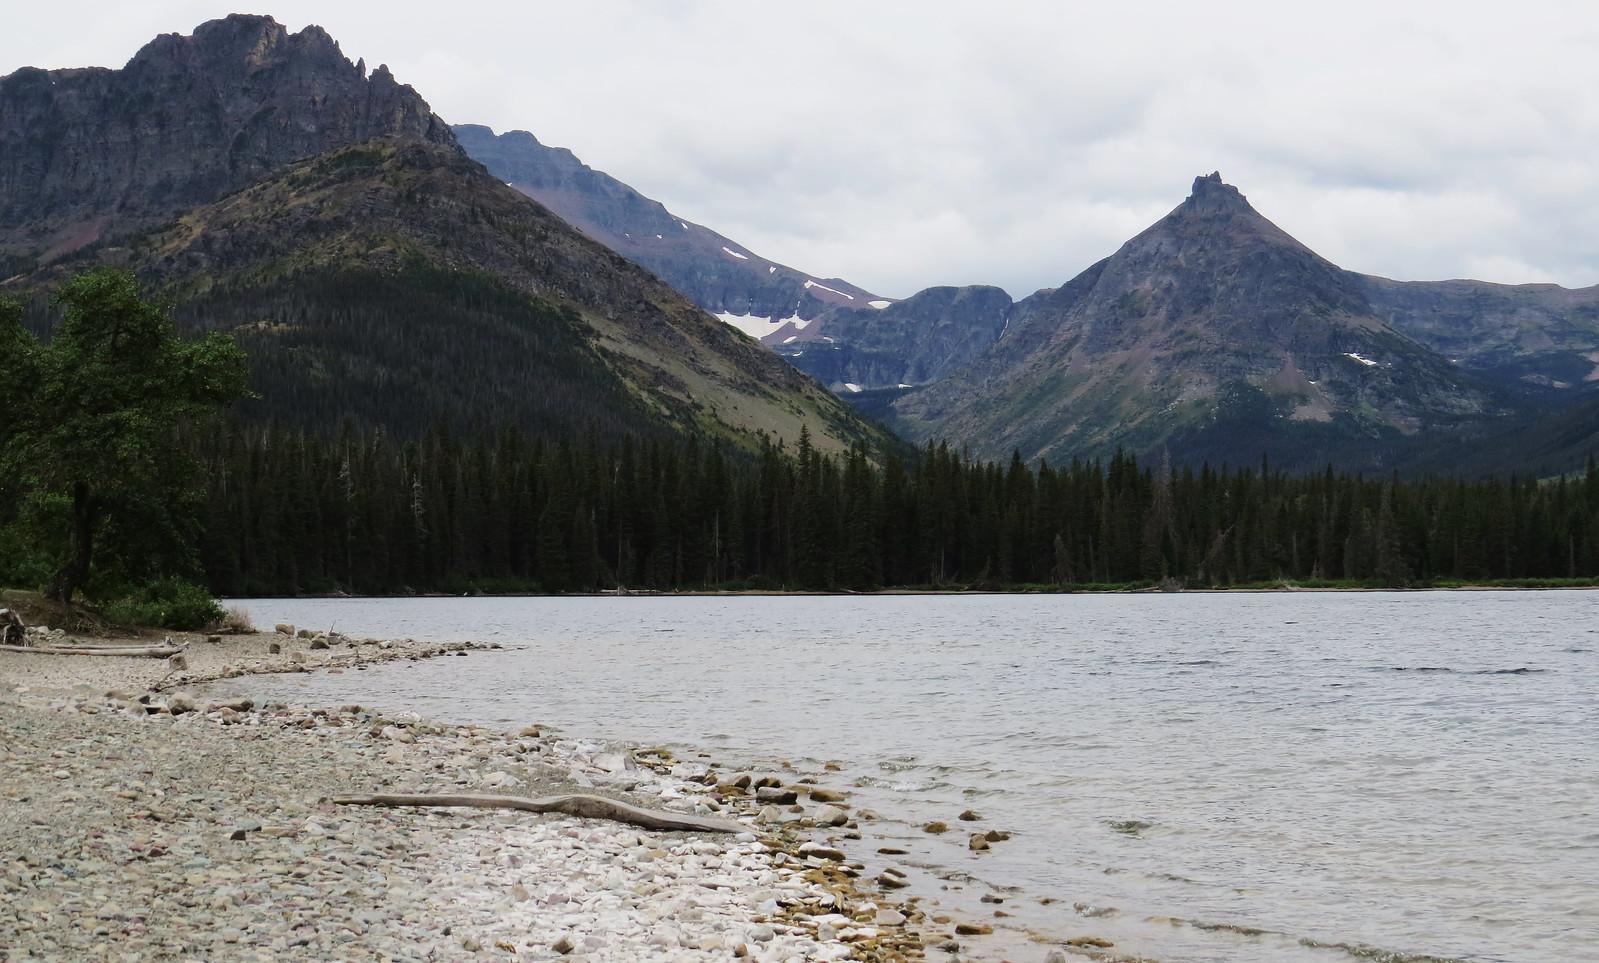 Appistoki Peak, Two Medicine Lake, Montana